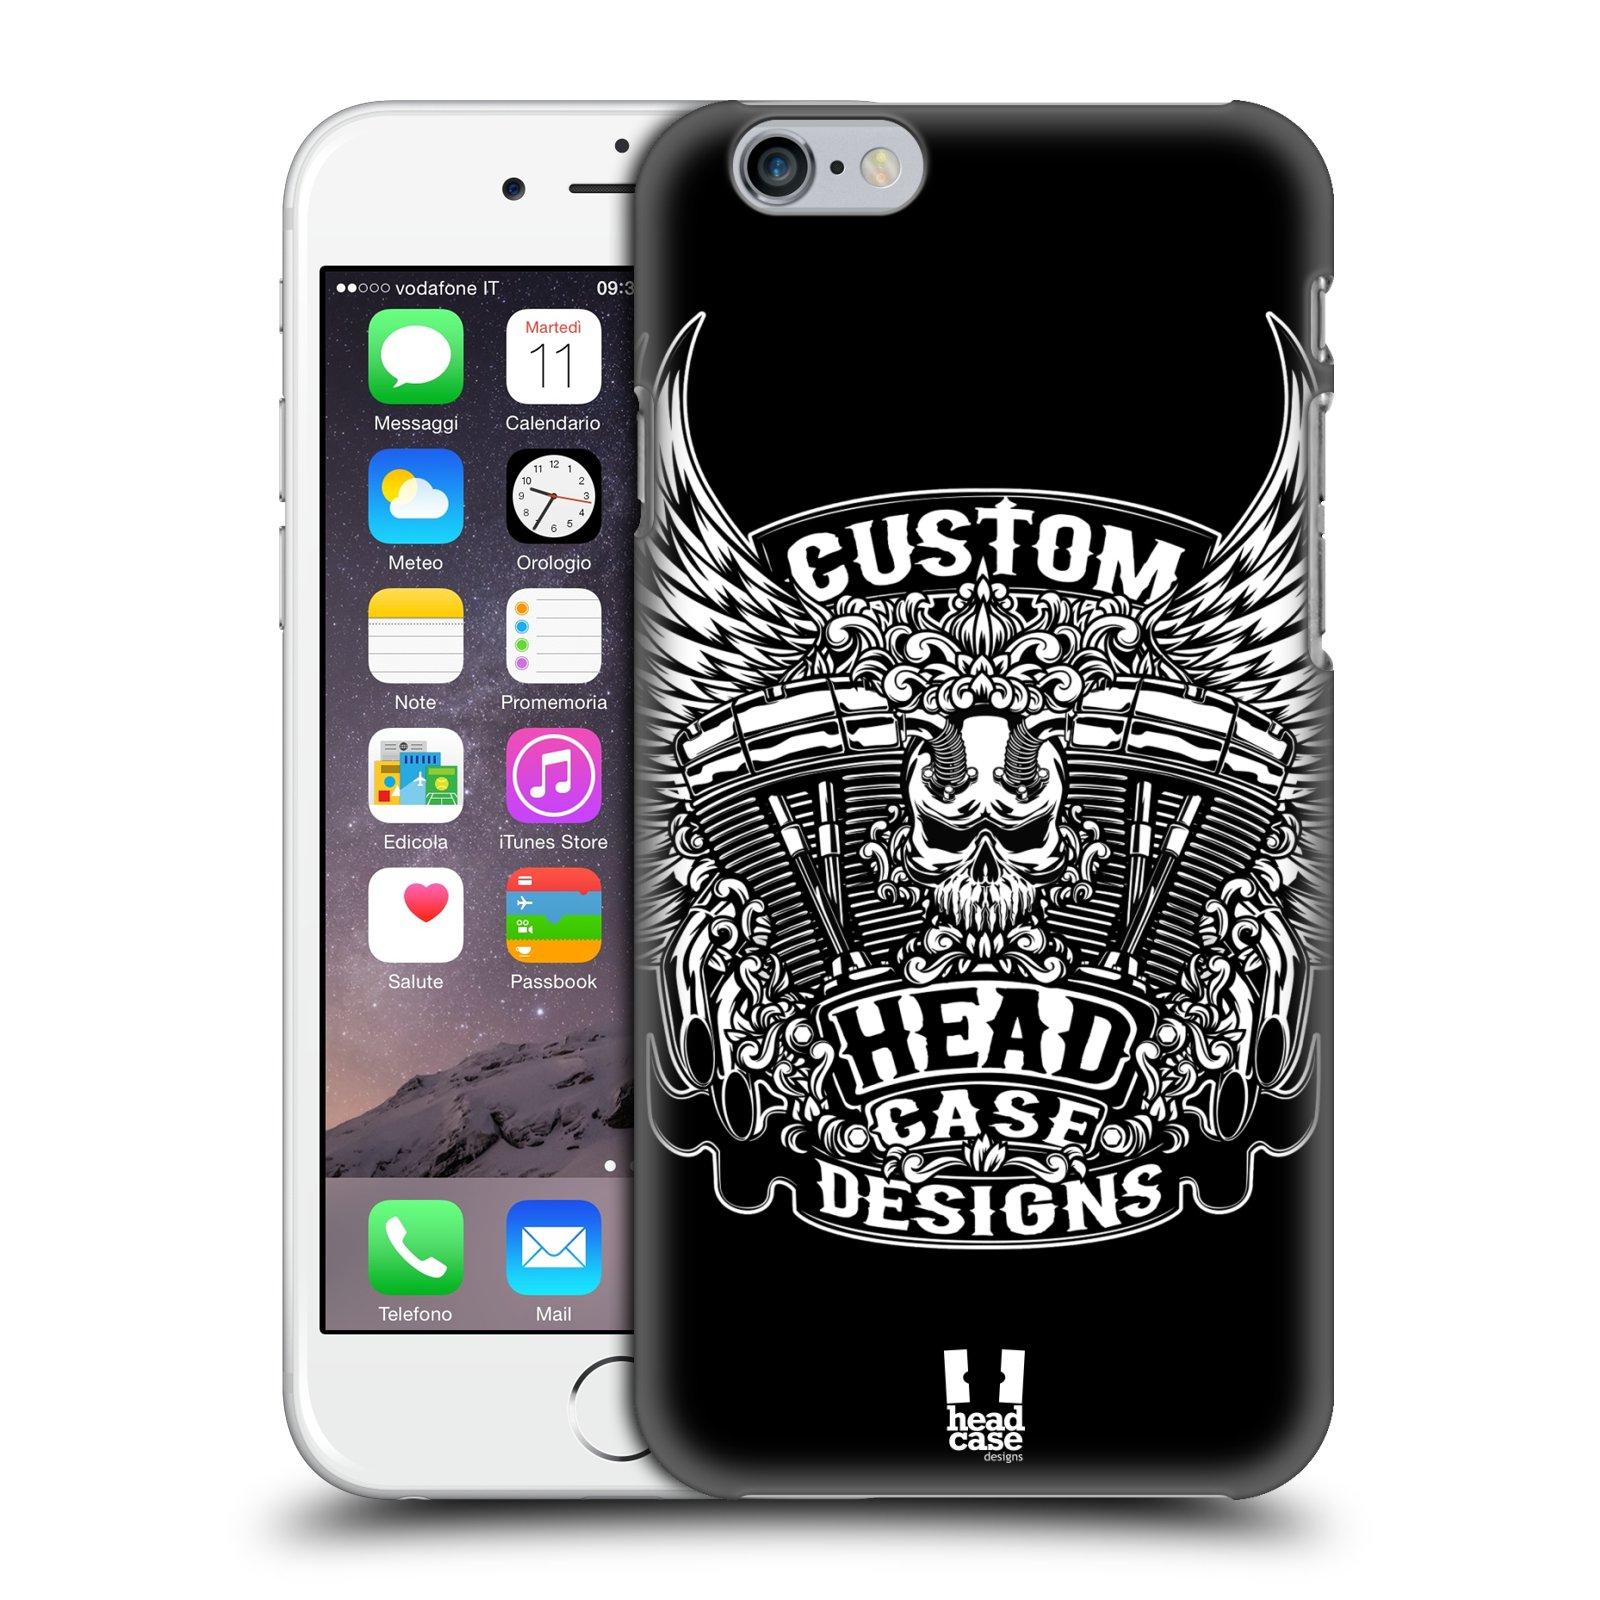 HEAD-CASE-DESIGNS-RIBELLI-HC-MOTORS-COVER-RETRO-RIGIDA-PER-APPLE-iPHONE-TELEFONI